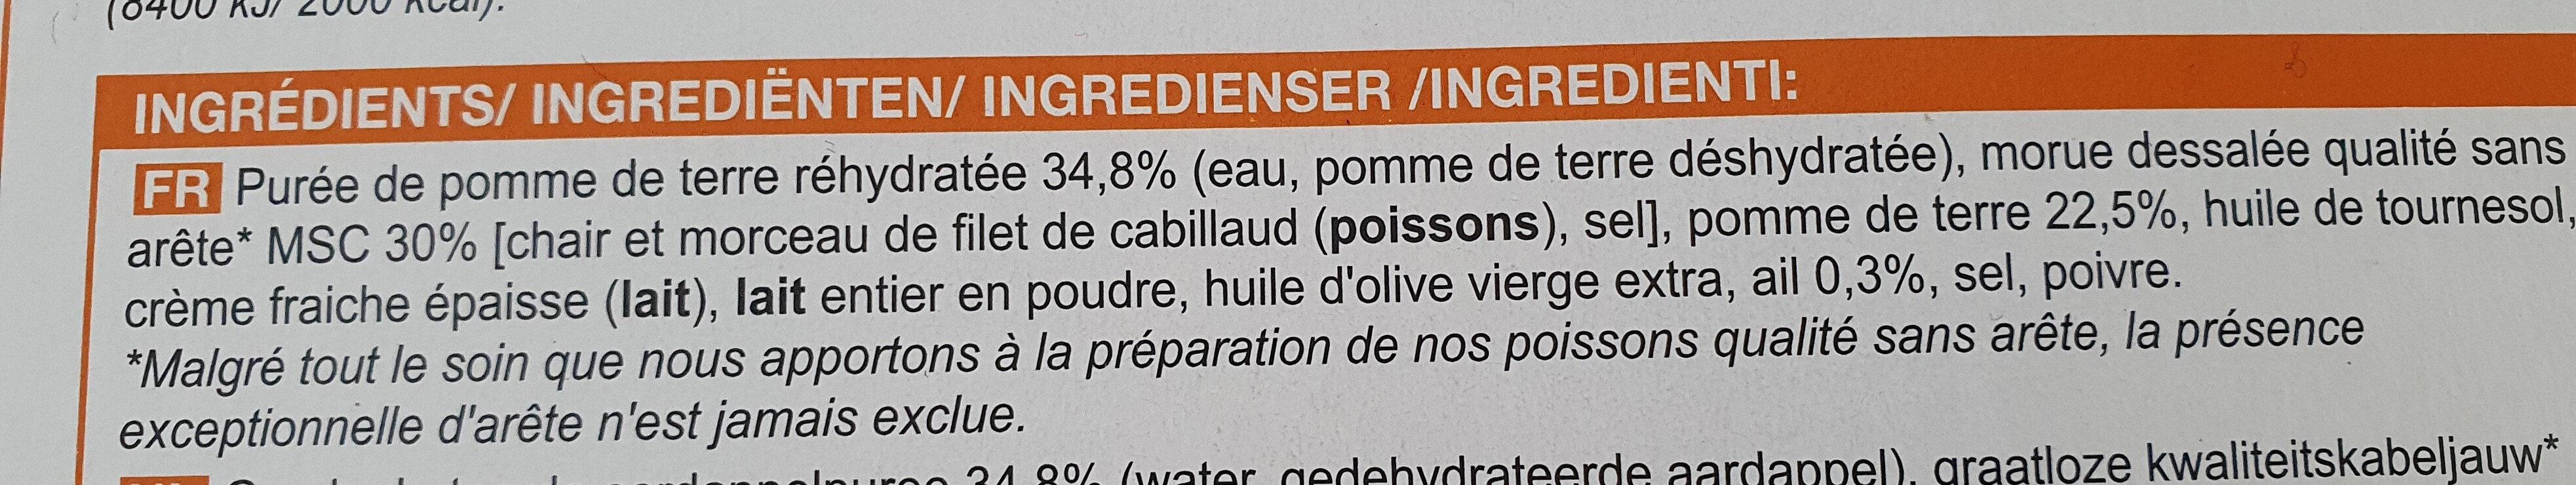 Brandade  parmentier de morue - Ingrediënten - fr